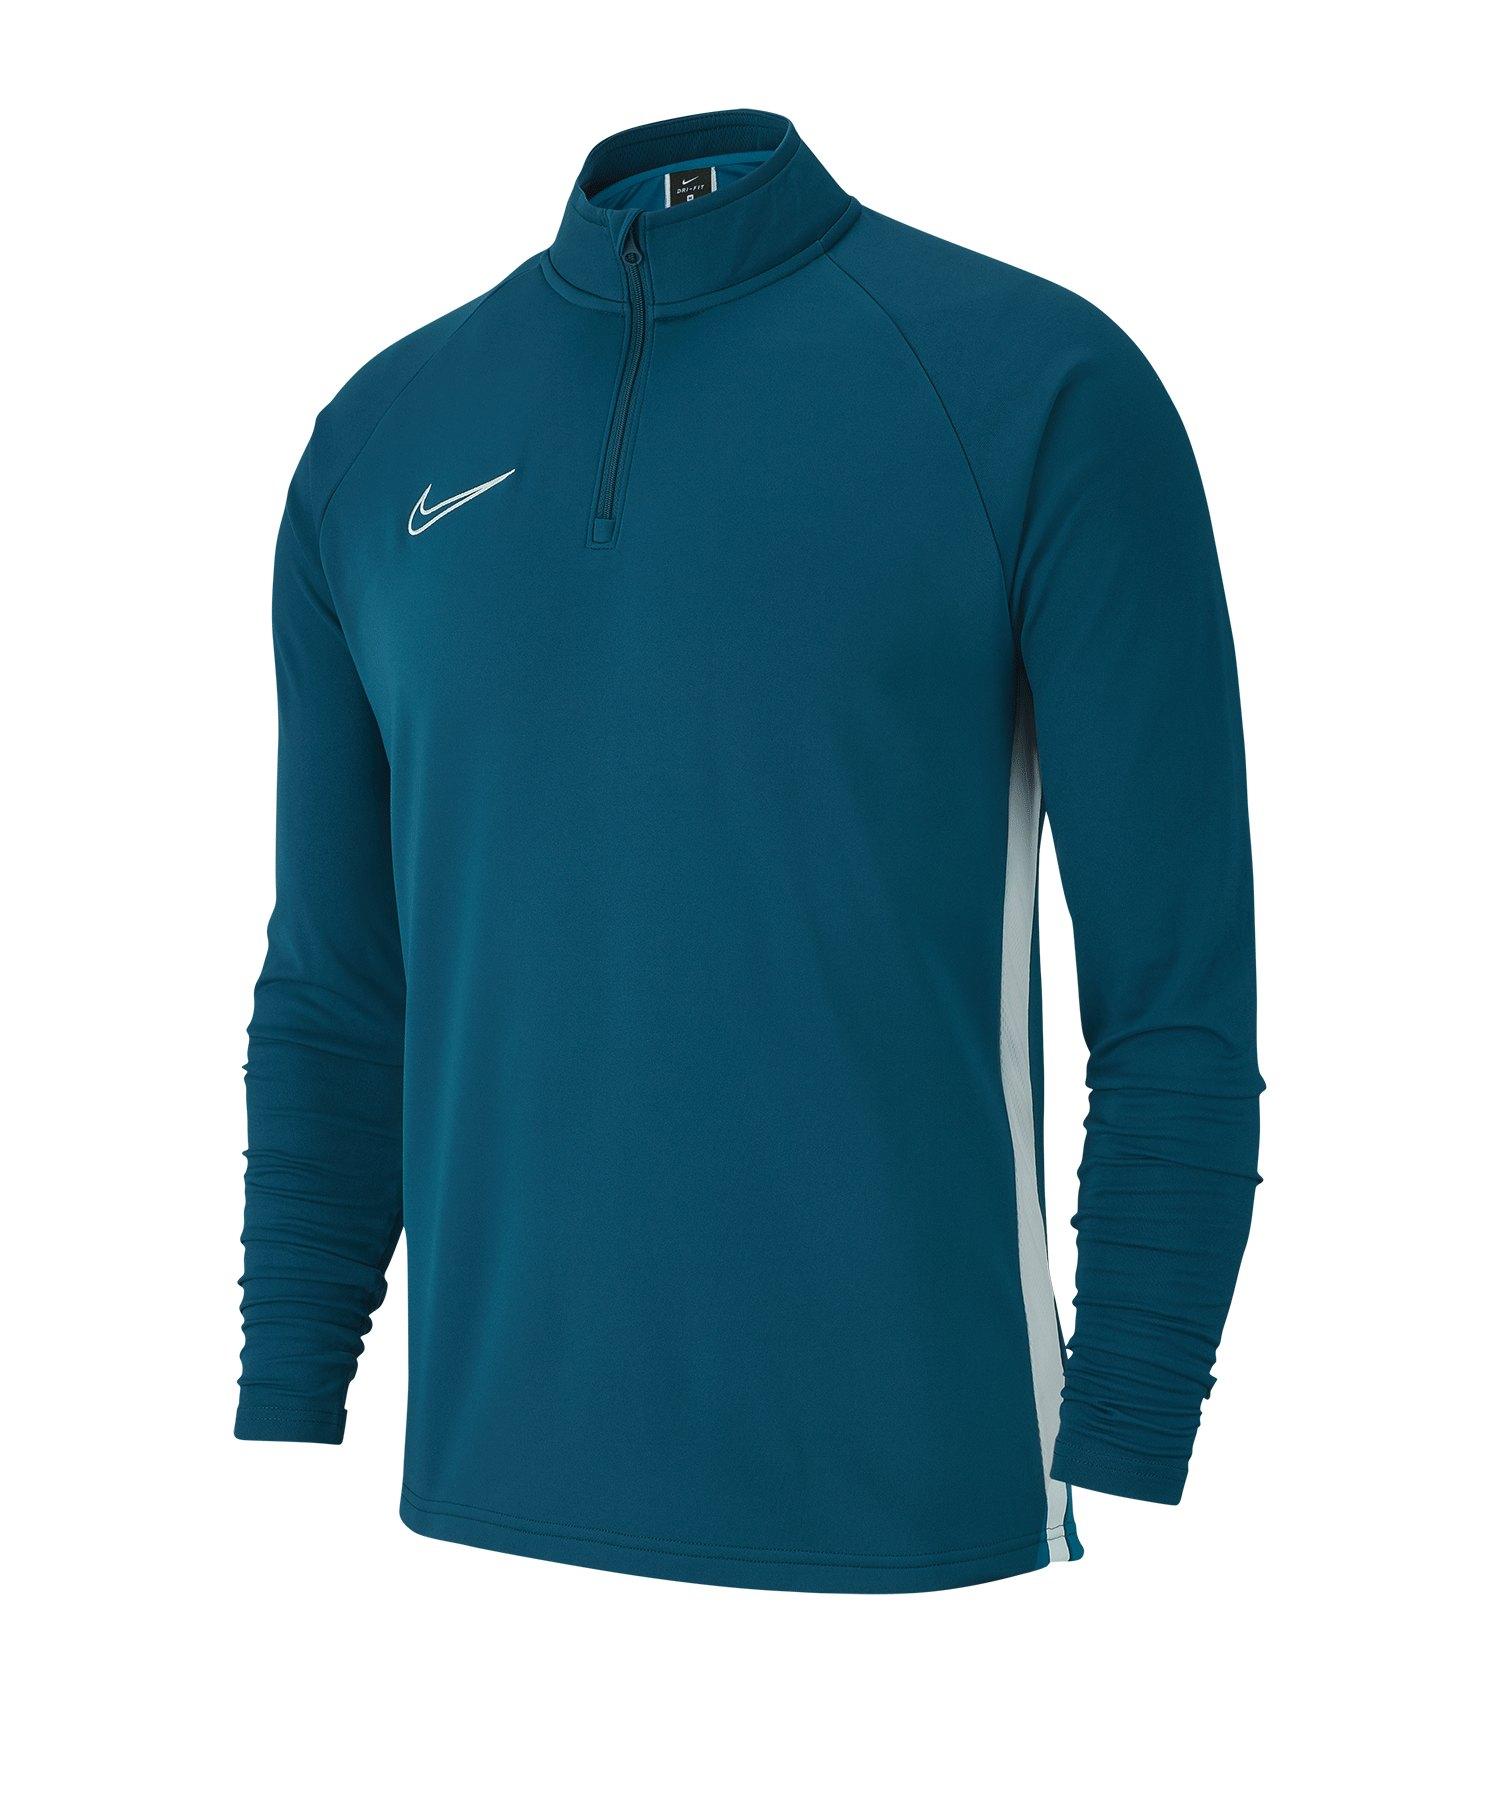 Nike Academy 19 1/4 Zip Drill Top Blau F404 - blau